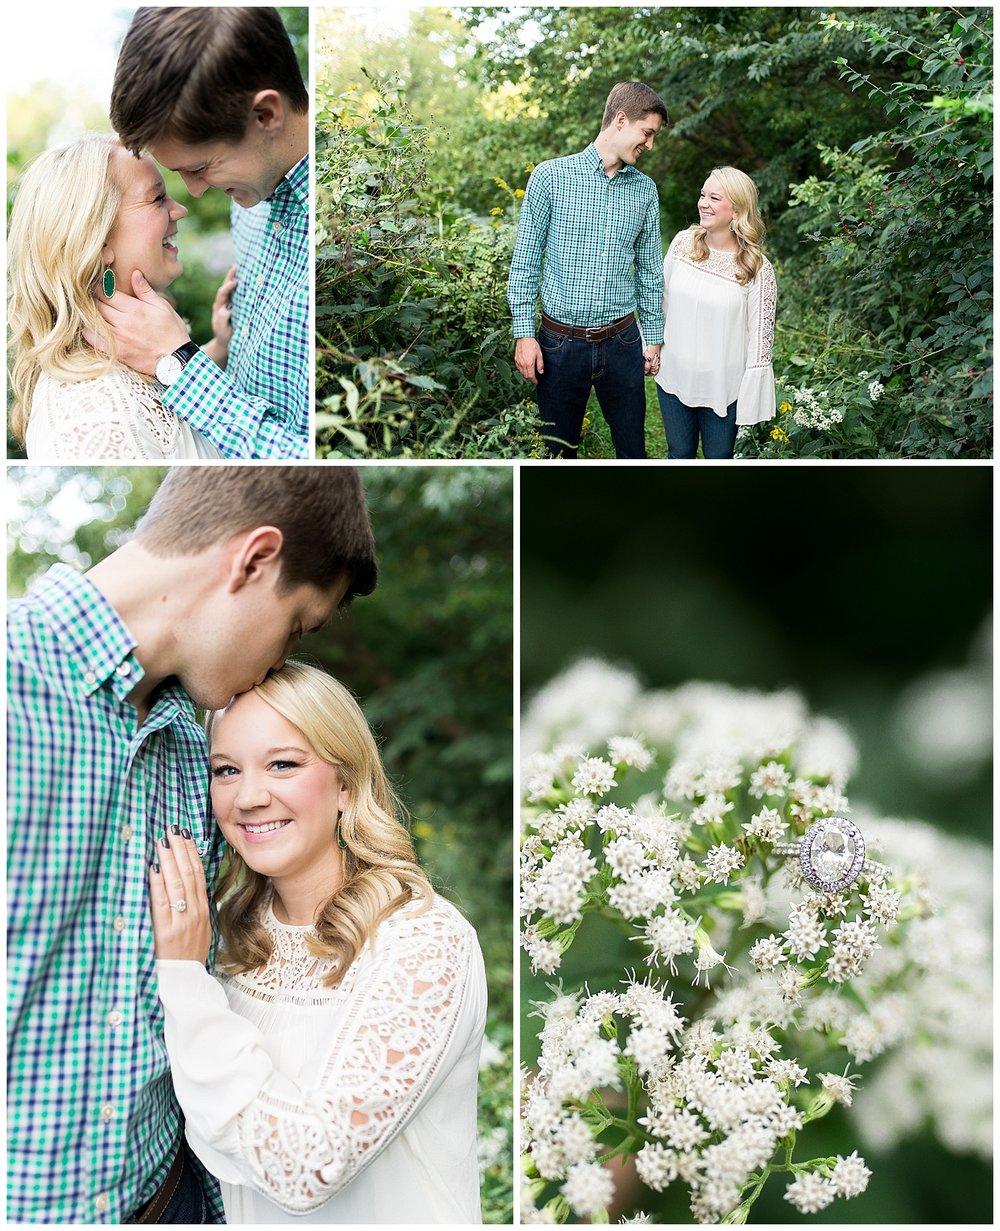 everleigh-photography-cincinnati-wedding-photographer-best-moments-of-2016-cincinnati-wedding-cincinnati-weddings-11